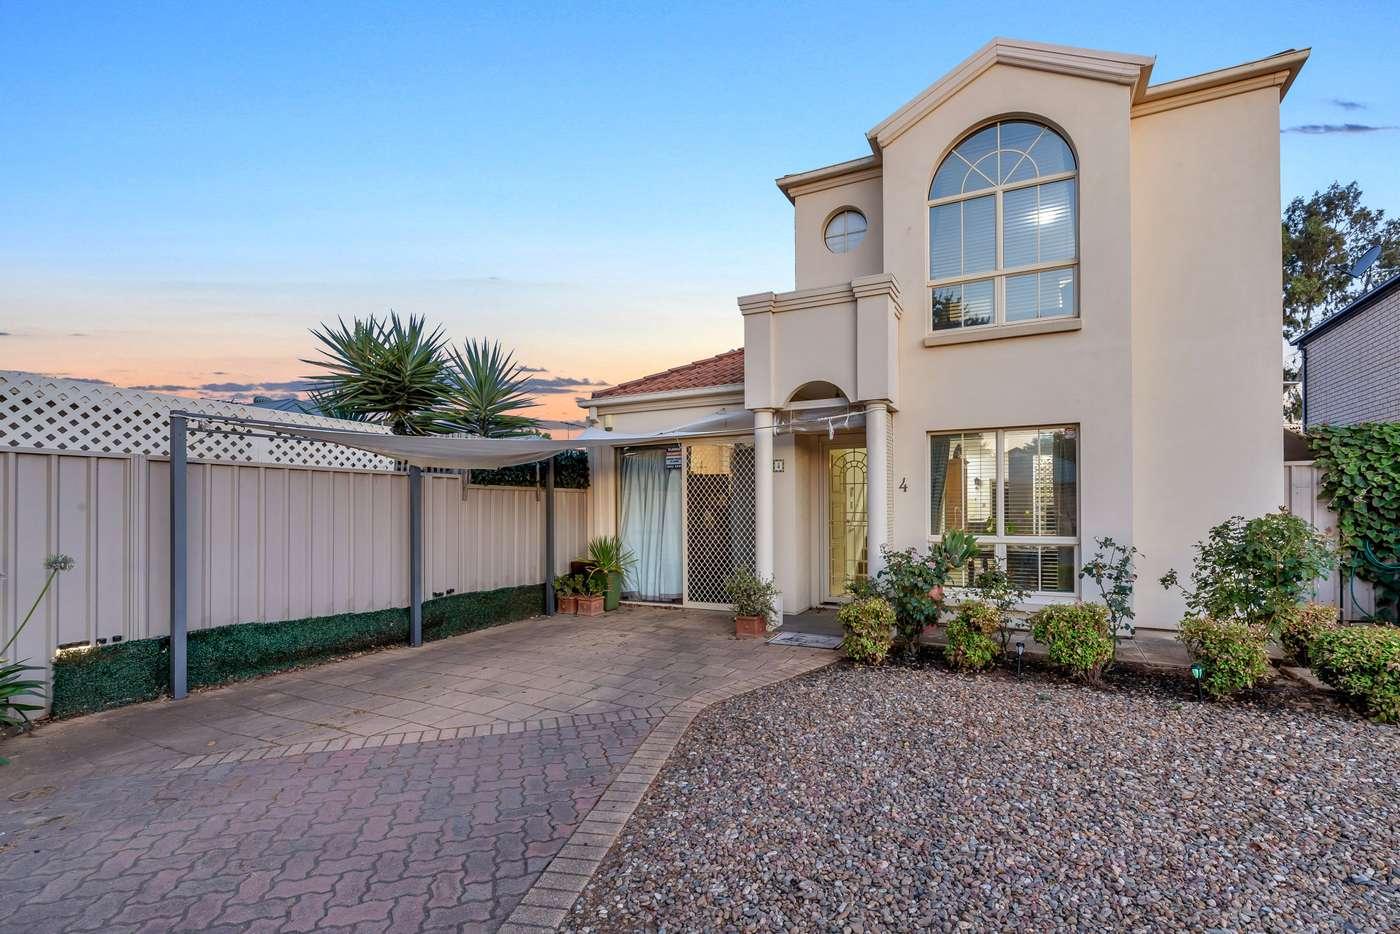 Main view of Homely house listing, 4 John Ridley Place, Ridleyton SA 5008